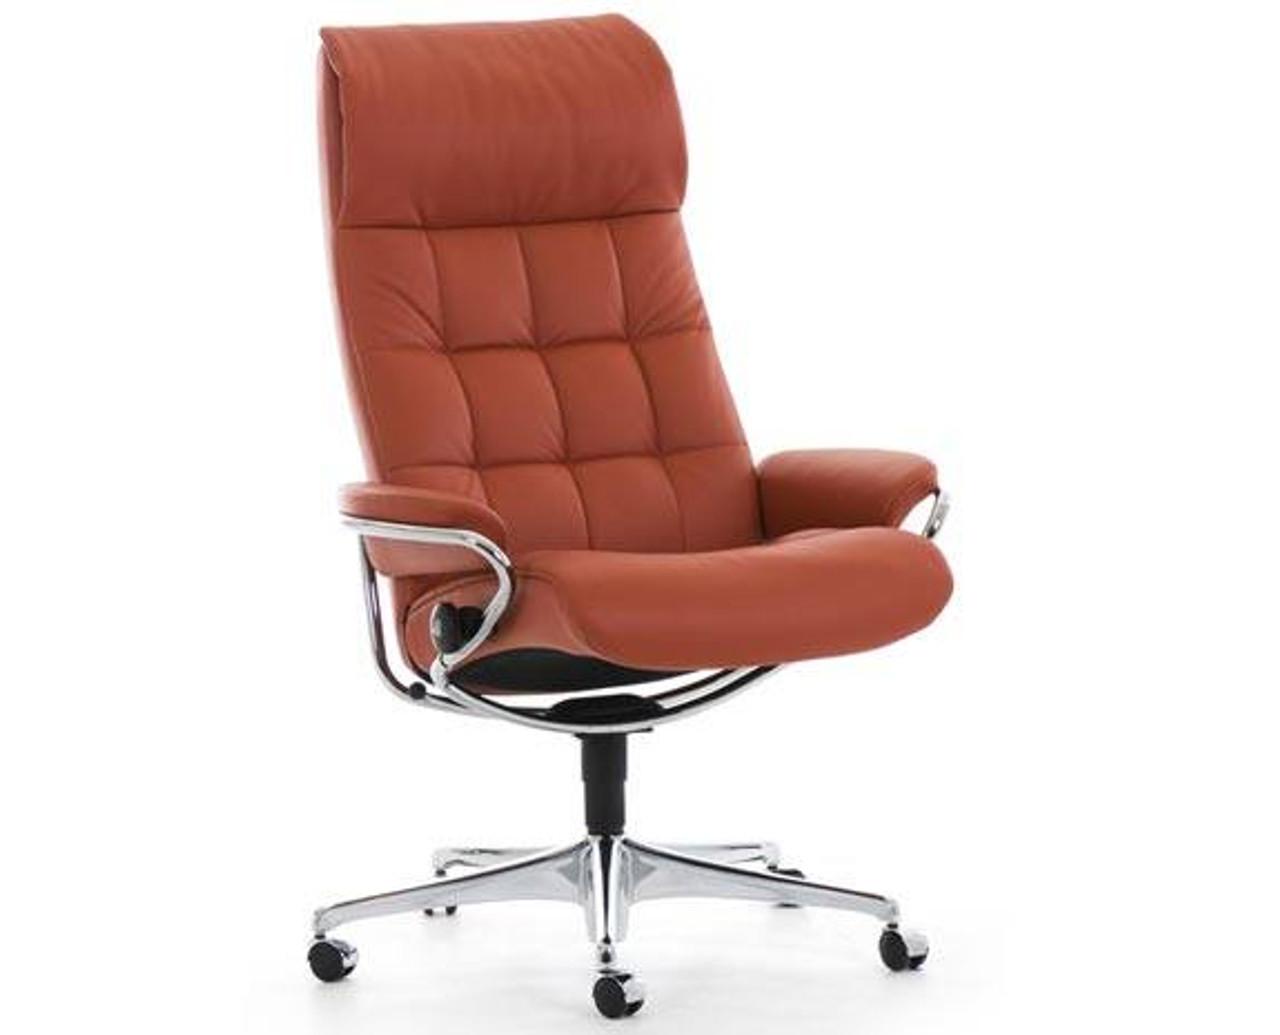 Stressless London High Back Office Chair By Ekornes